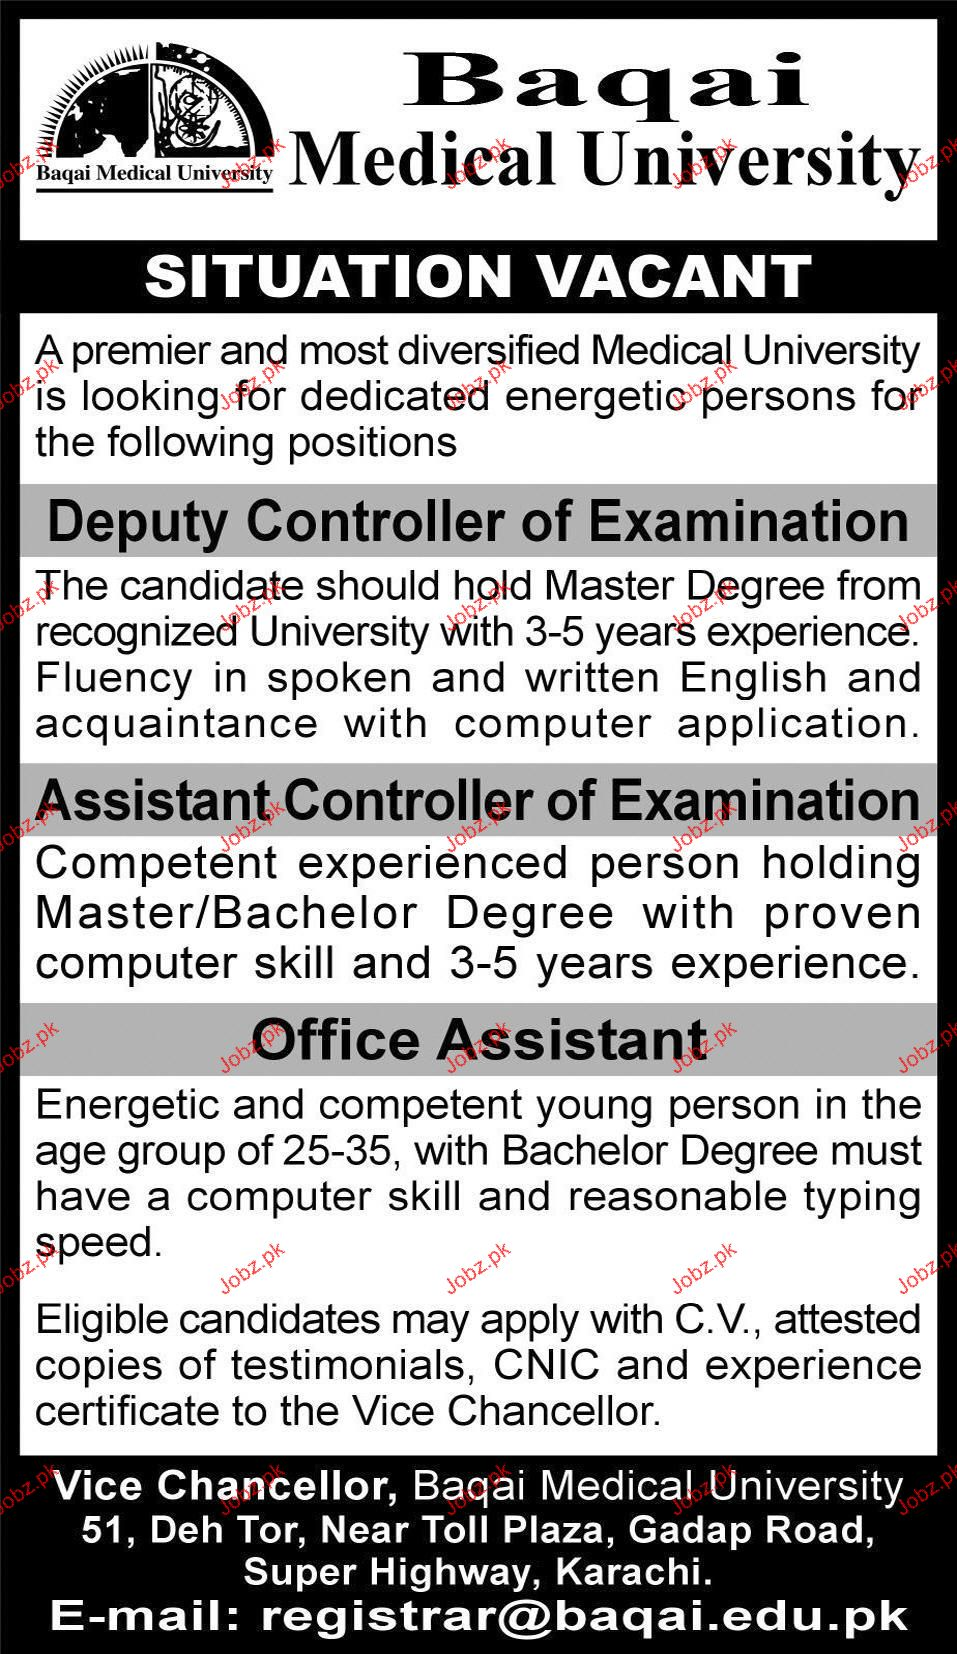 Deputy Controller of Examination Job Opportunity